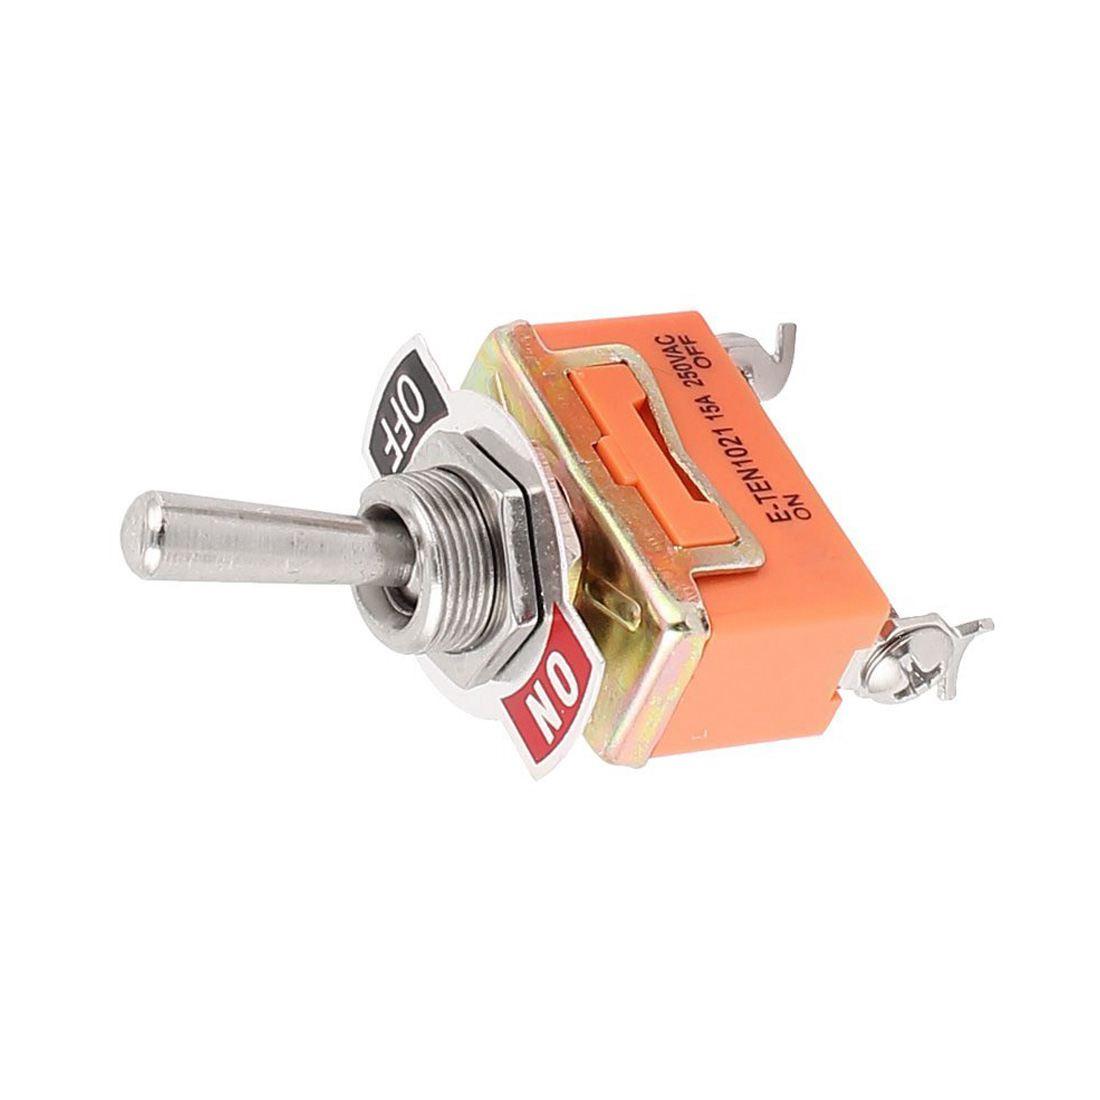 Fp Ac 250v 15a Spst On Off 2 Pin Latching Miniature Toggle Switch Onoff 2pcs E5d6 O8q4